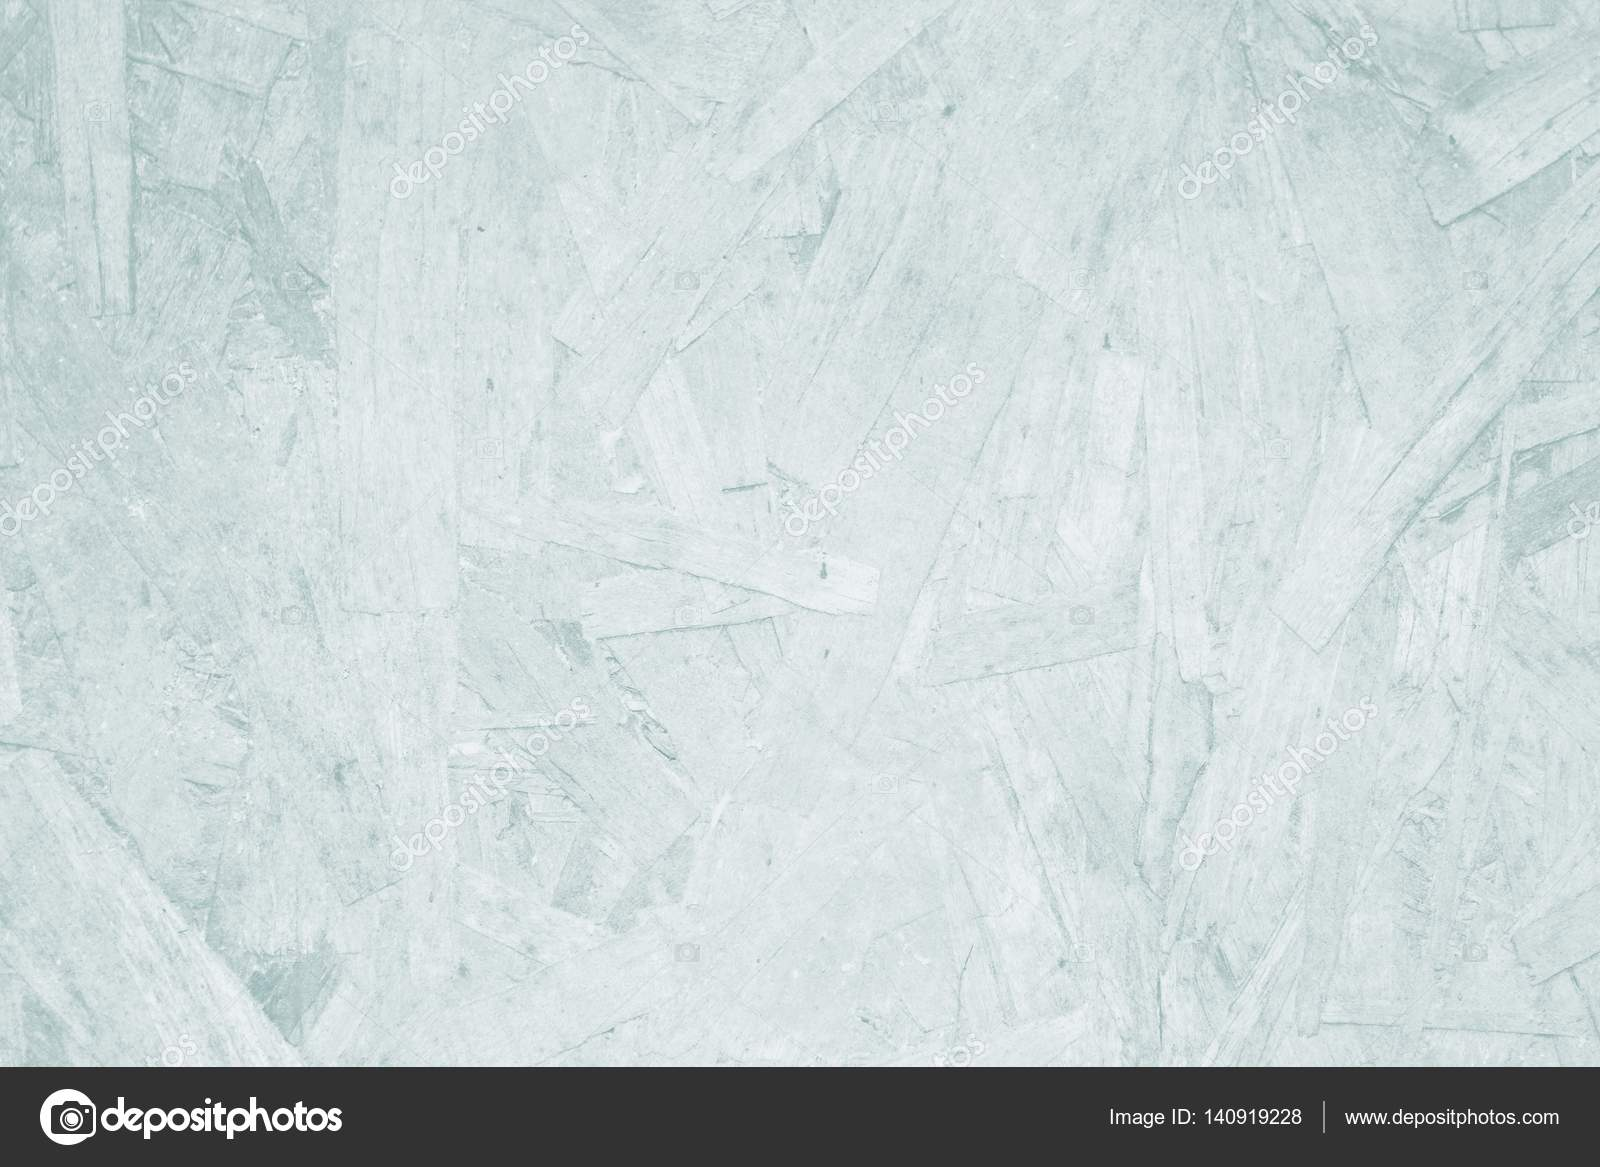 Farbige Osb Platten designer textur lackierten osb platten stockfoto